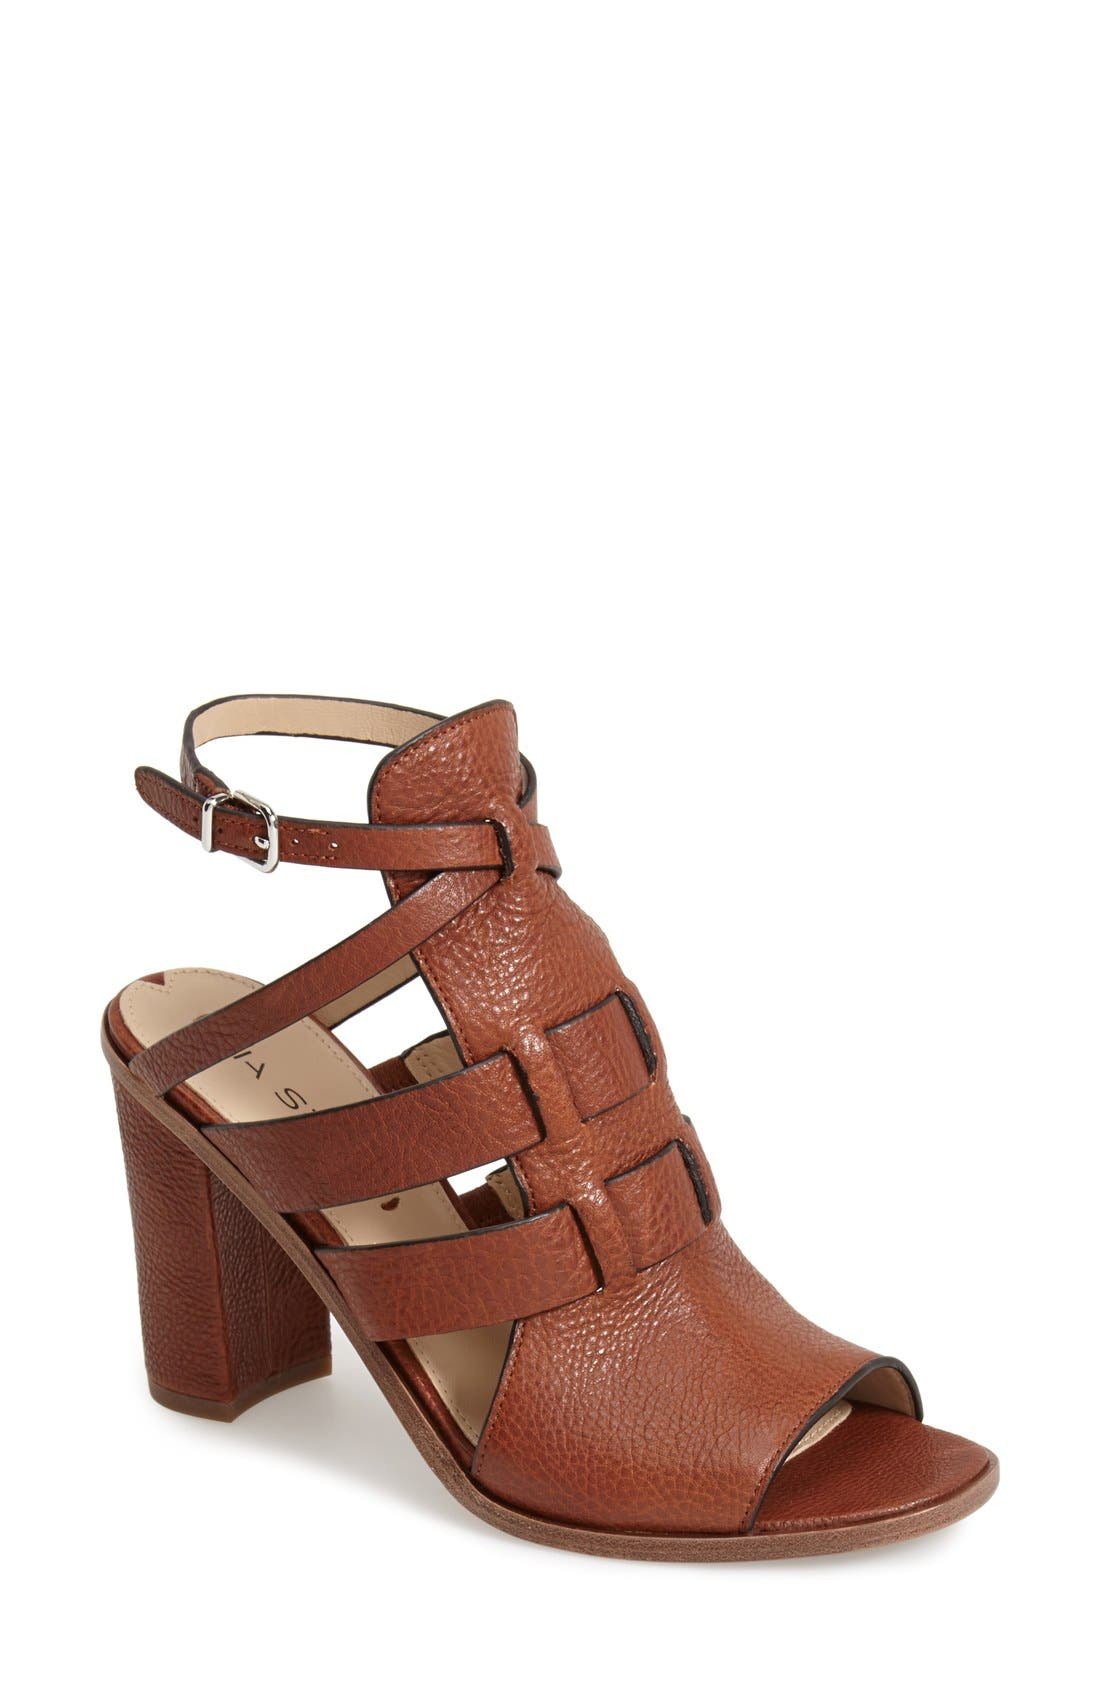 Main Image - Via Spiga 'Brandina' Leather Sandal (Women)